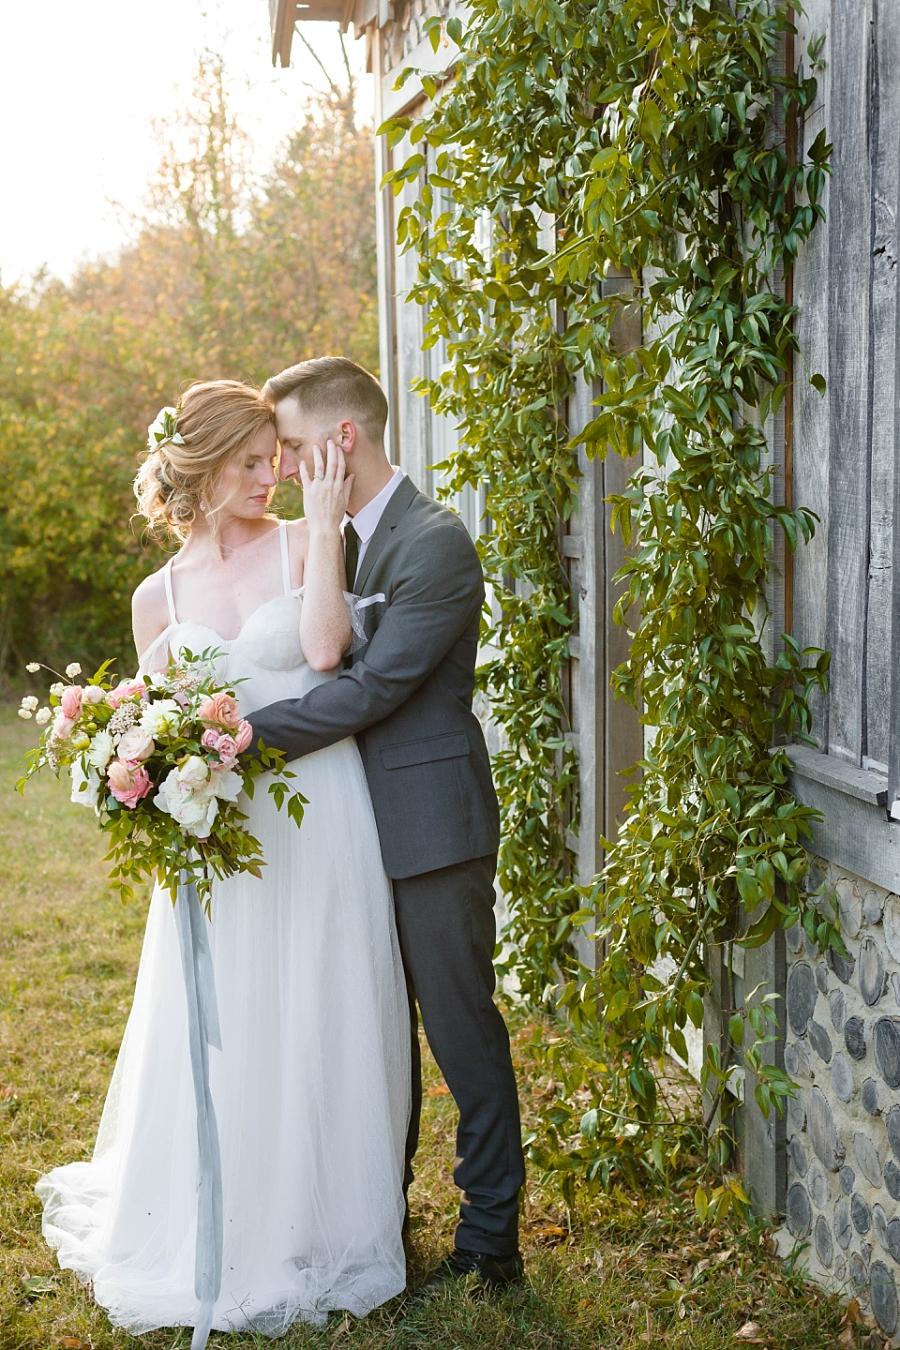 Stacy-Anderson-Photography-Nashville-Houston-Destination-Wedding-Photographer_0027-1.jpg